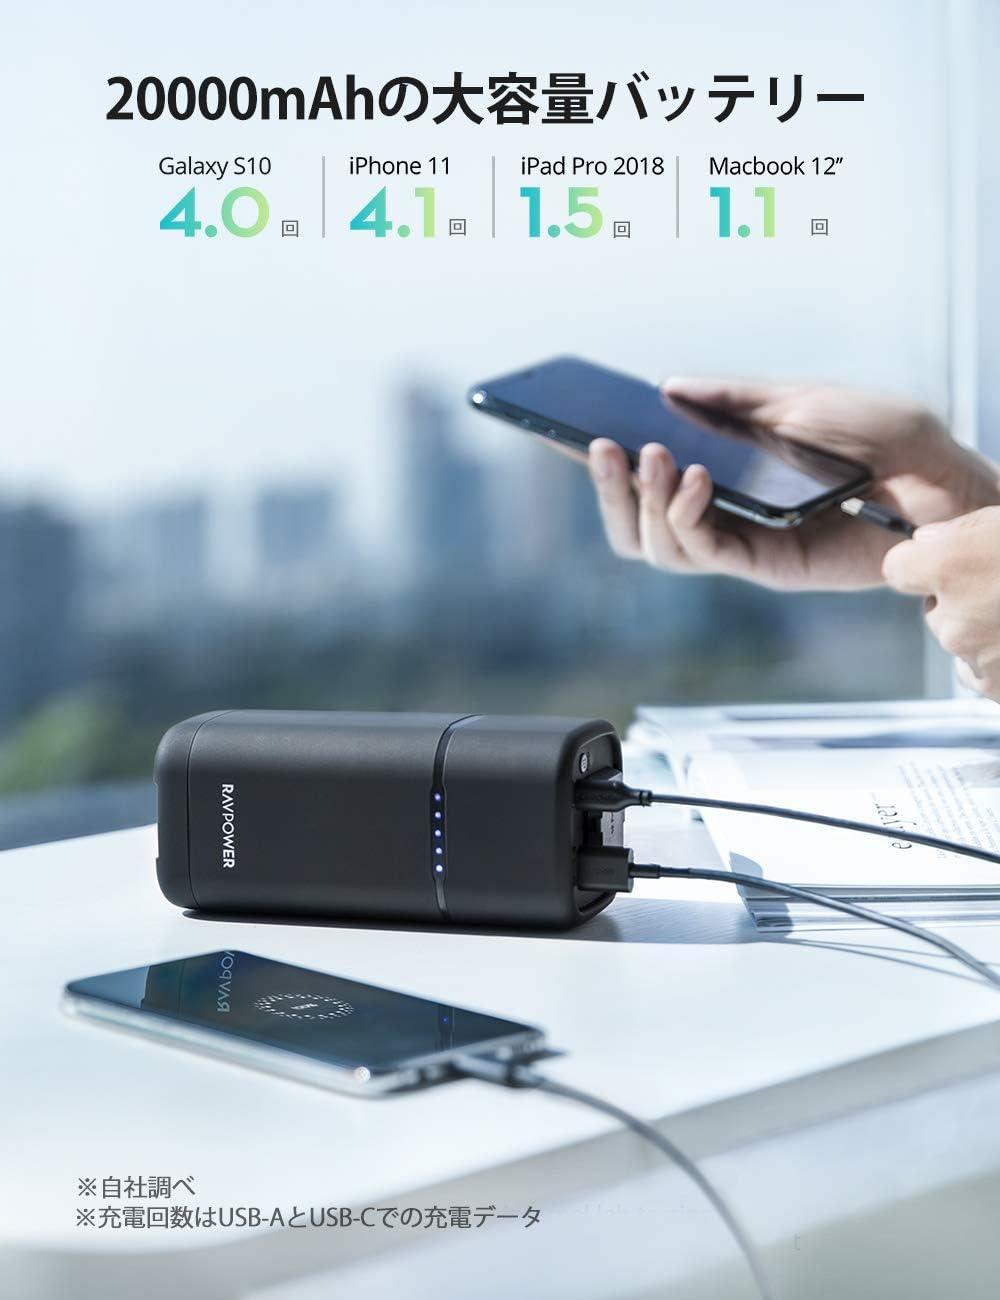 RP-PB054proの容量は20000mAで、iPhoneを4回、iPad Proを1.5回、Macbookを1回充電できる